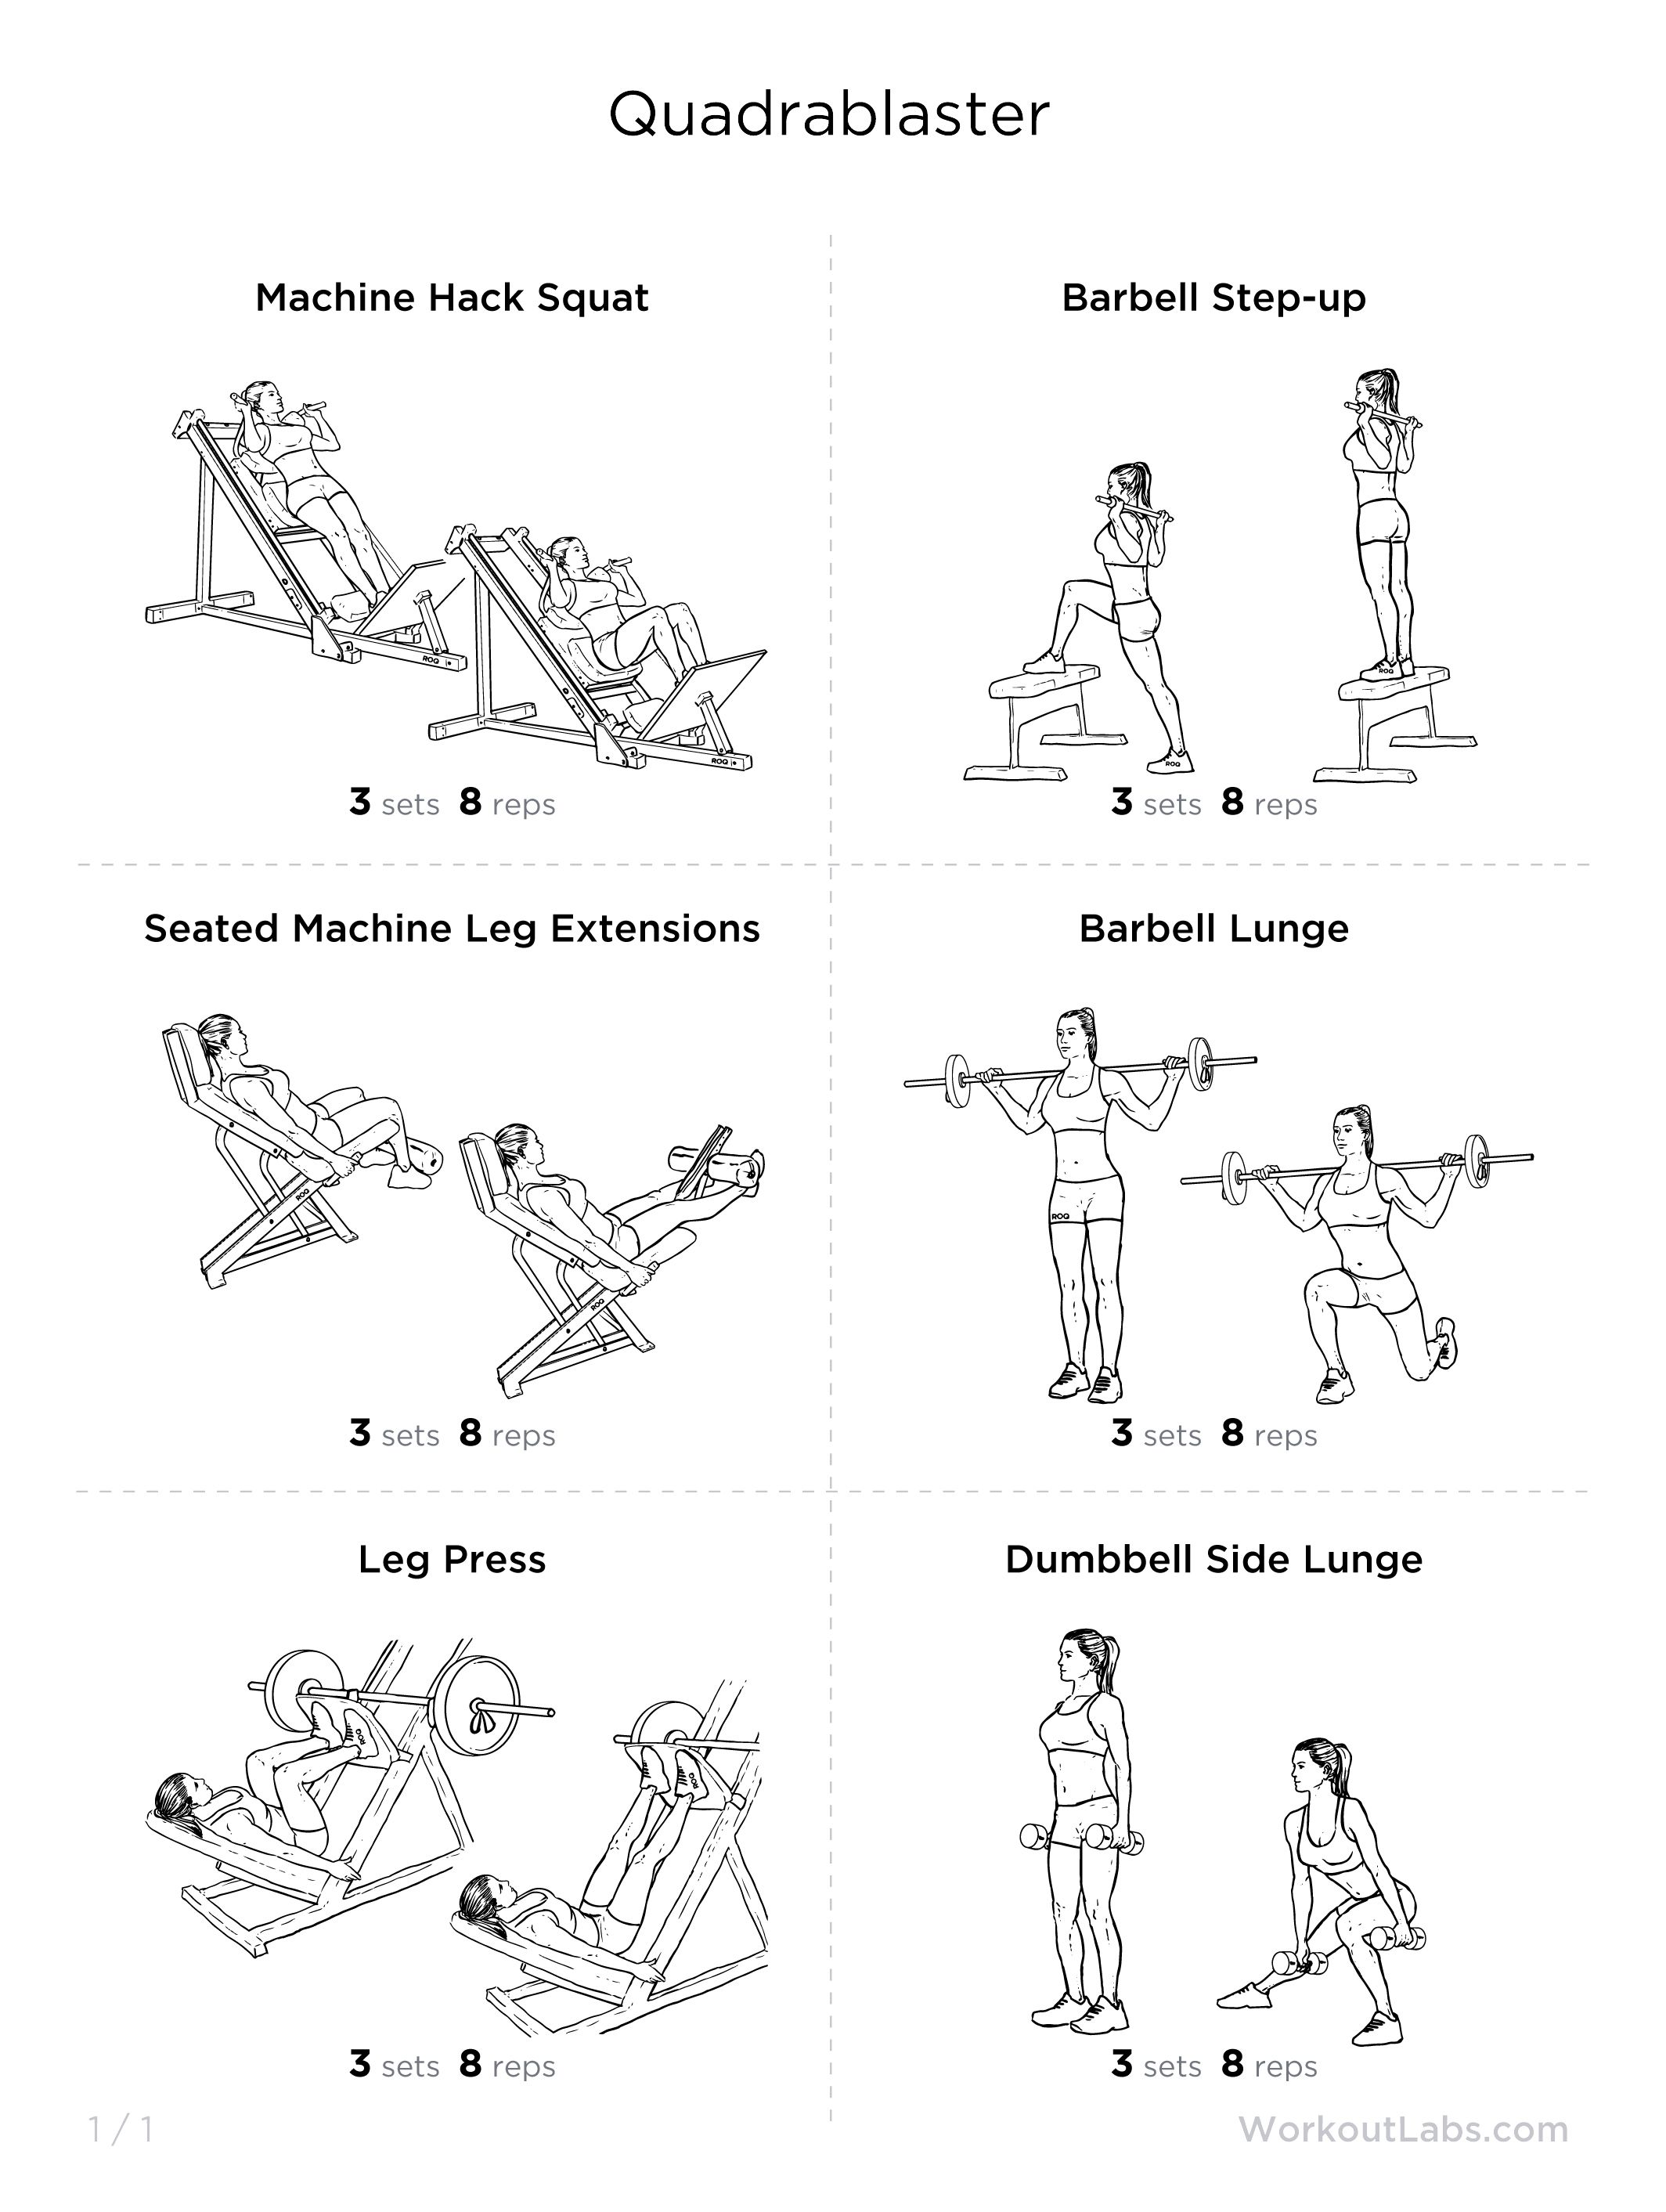 Quadrablaster the quad focused leg workout bombshell